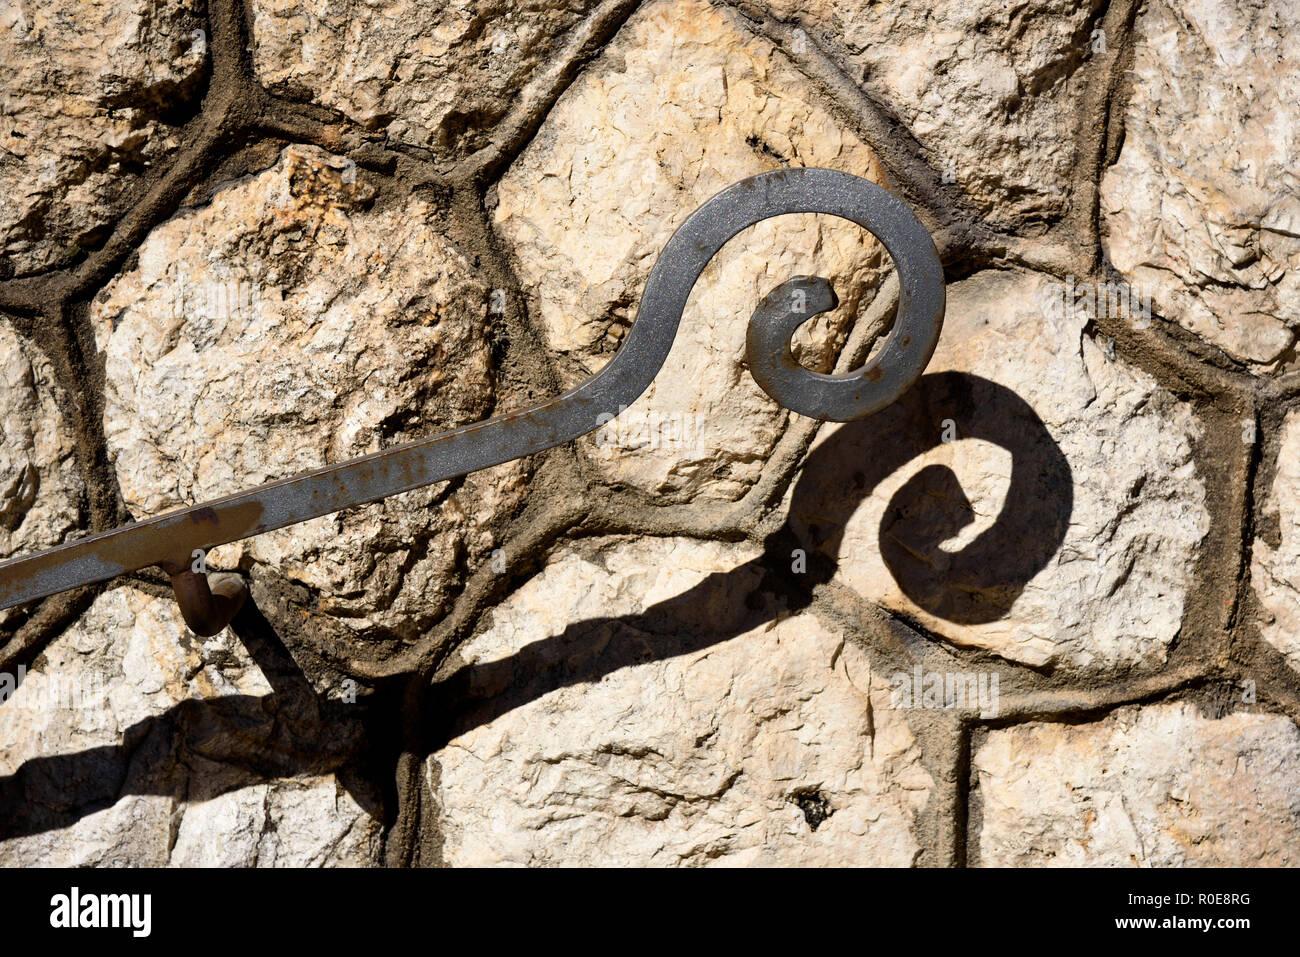 Cagliari Sardinia Italy - Stock Image